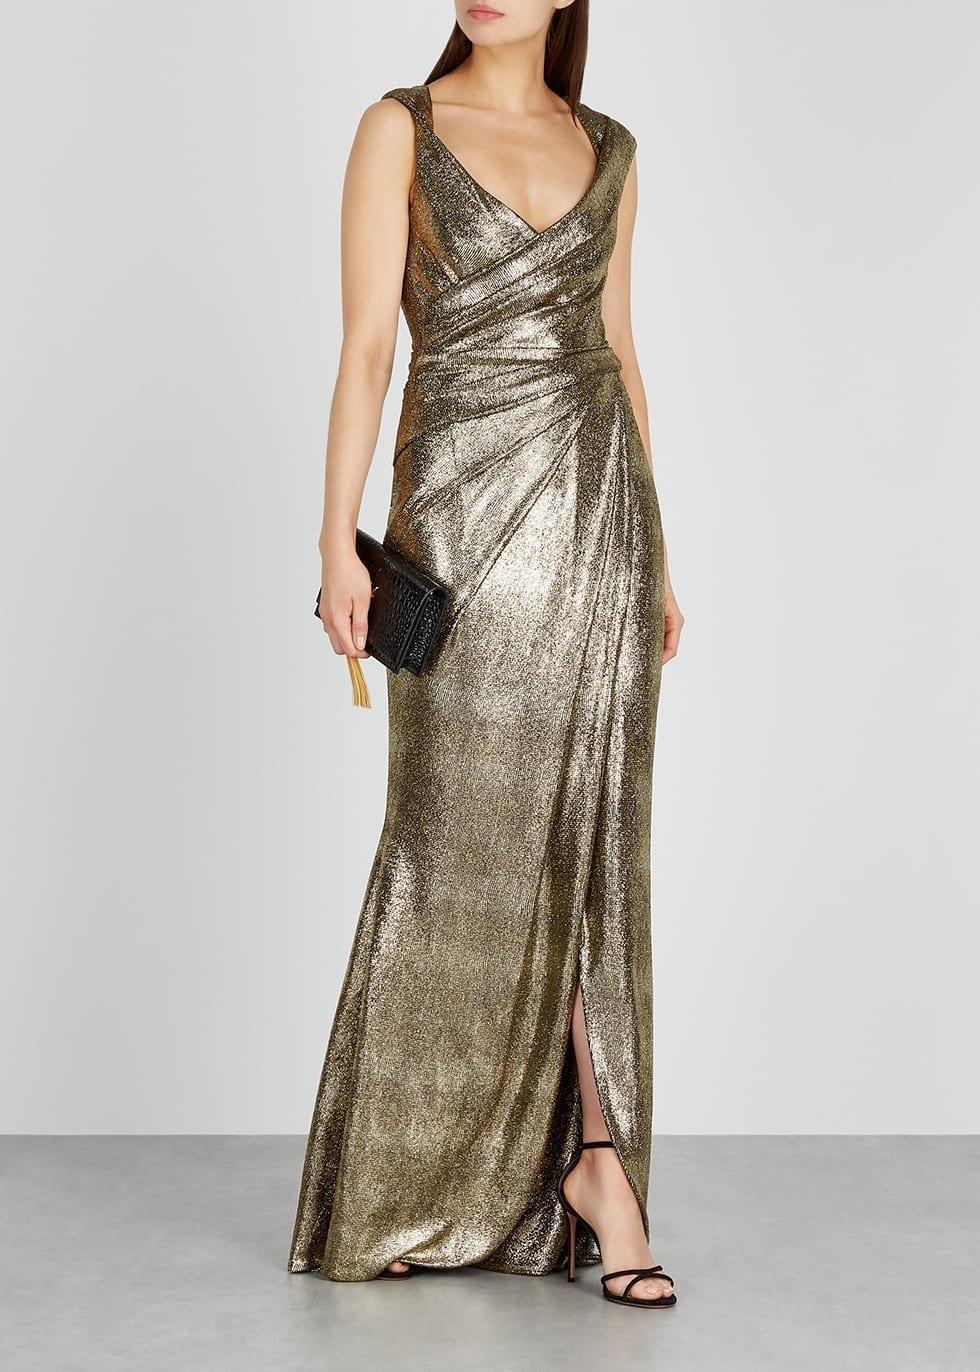 TALBOT RUNHOF Towanda Gold Foil-print Gown